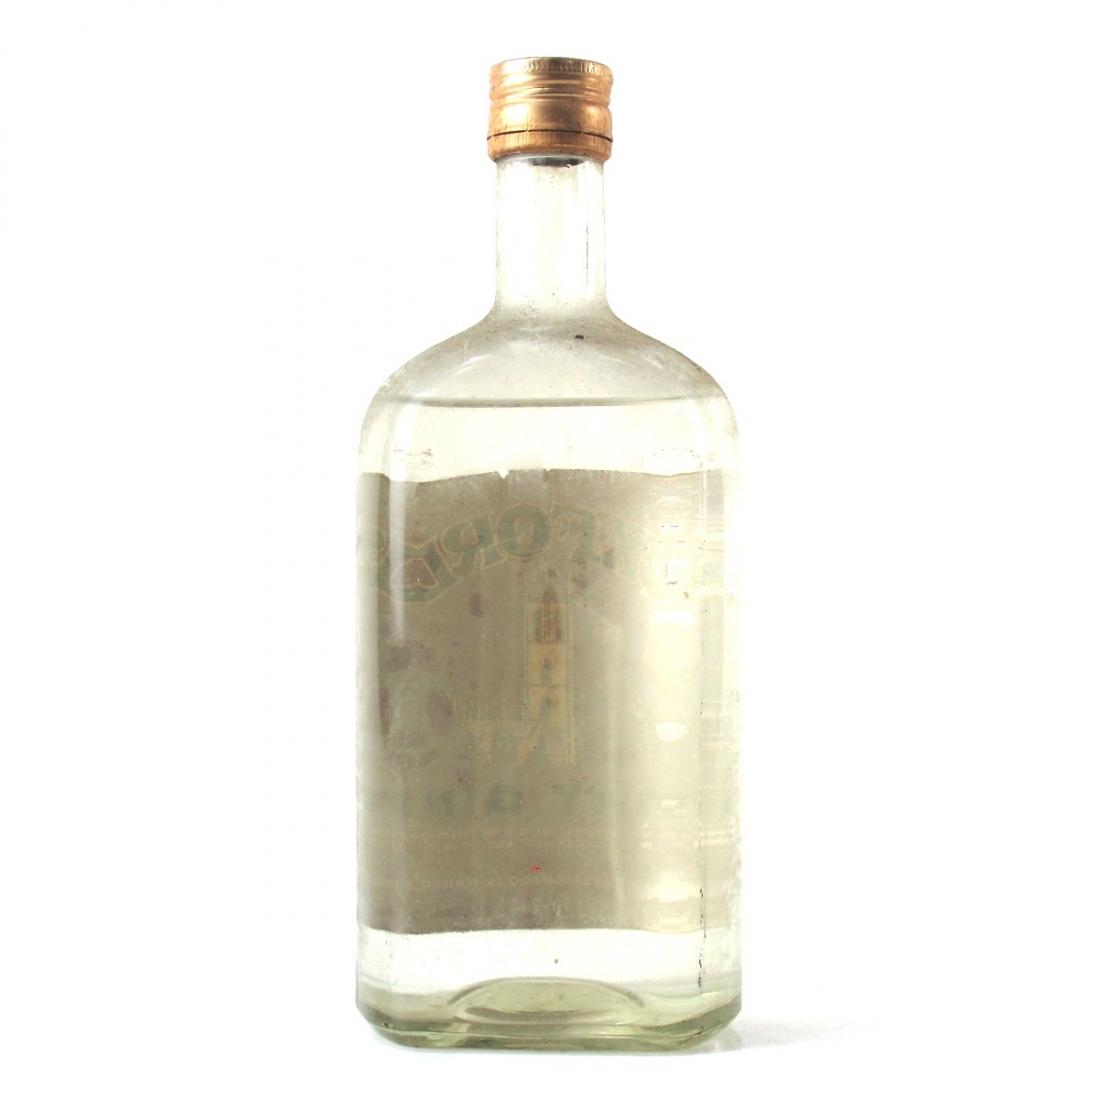 Oxford Dry Gin circa 1970s